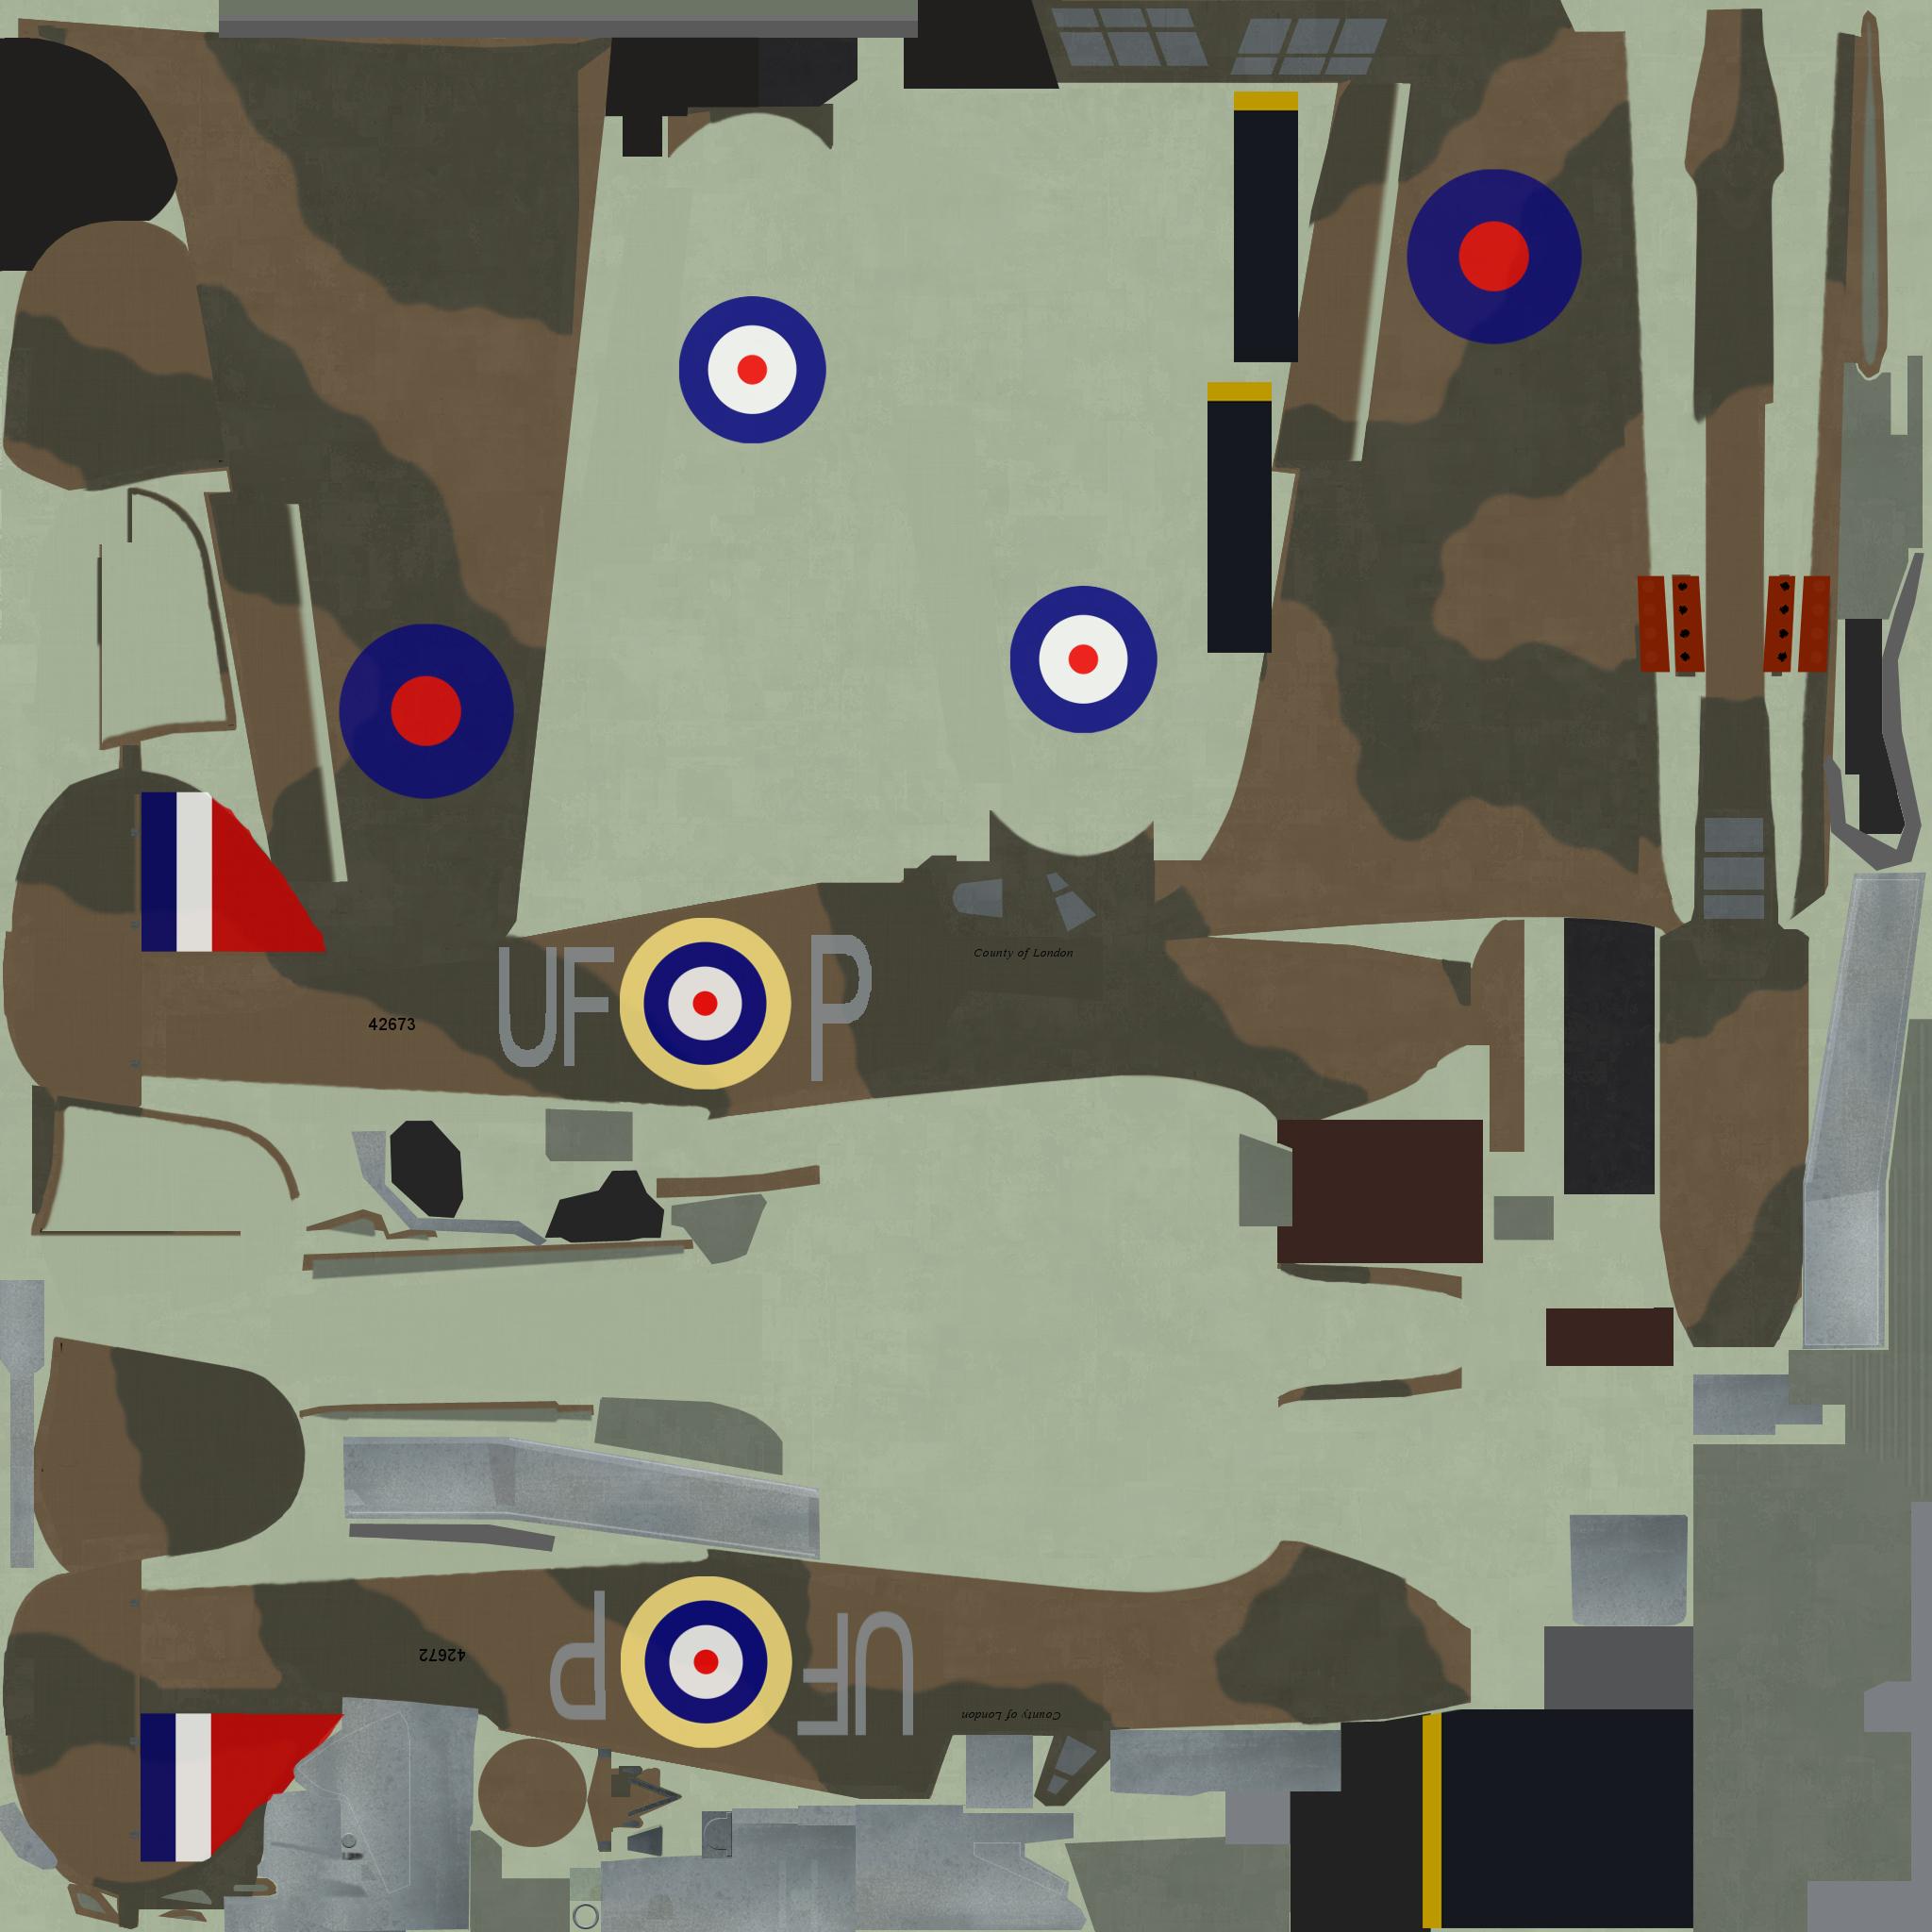 COD PD Hurricane I RAF 601Sqn UFP England 1940